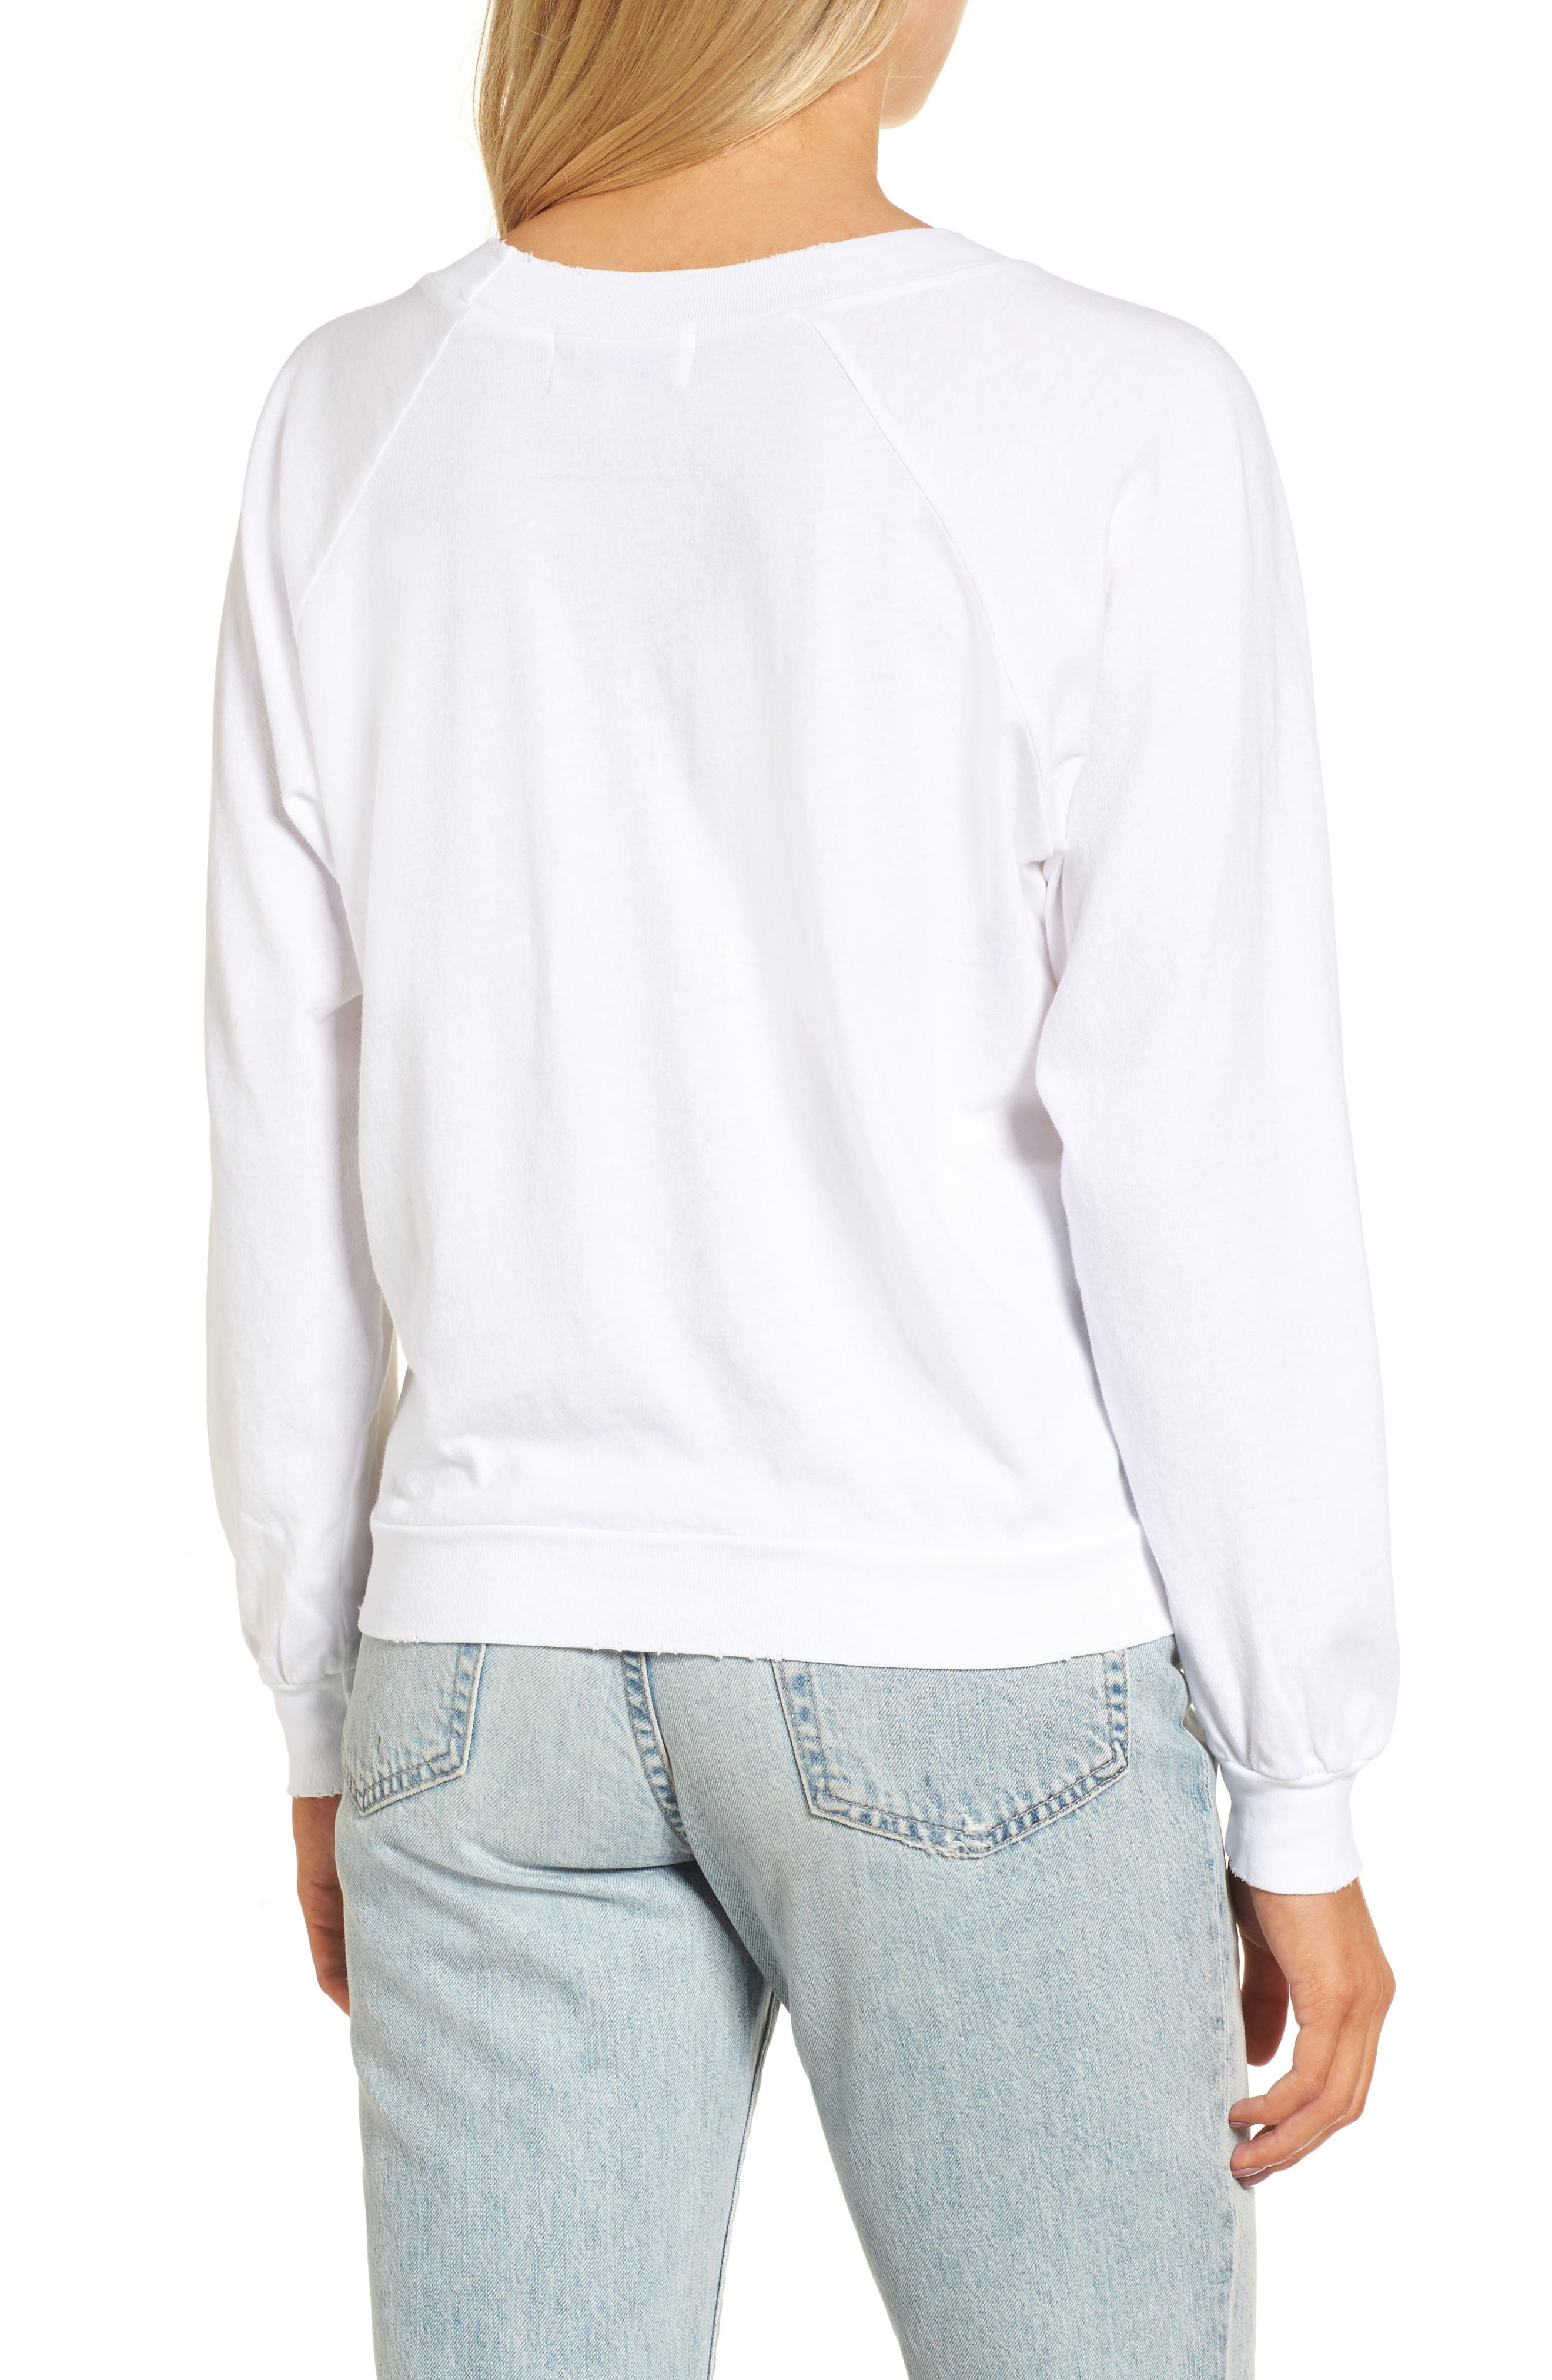 Broad City Cotton Graphic Sweatshirt,                             Alternate thumbnail 2, color,                             100